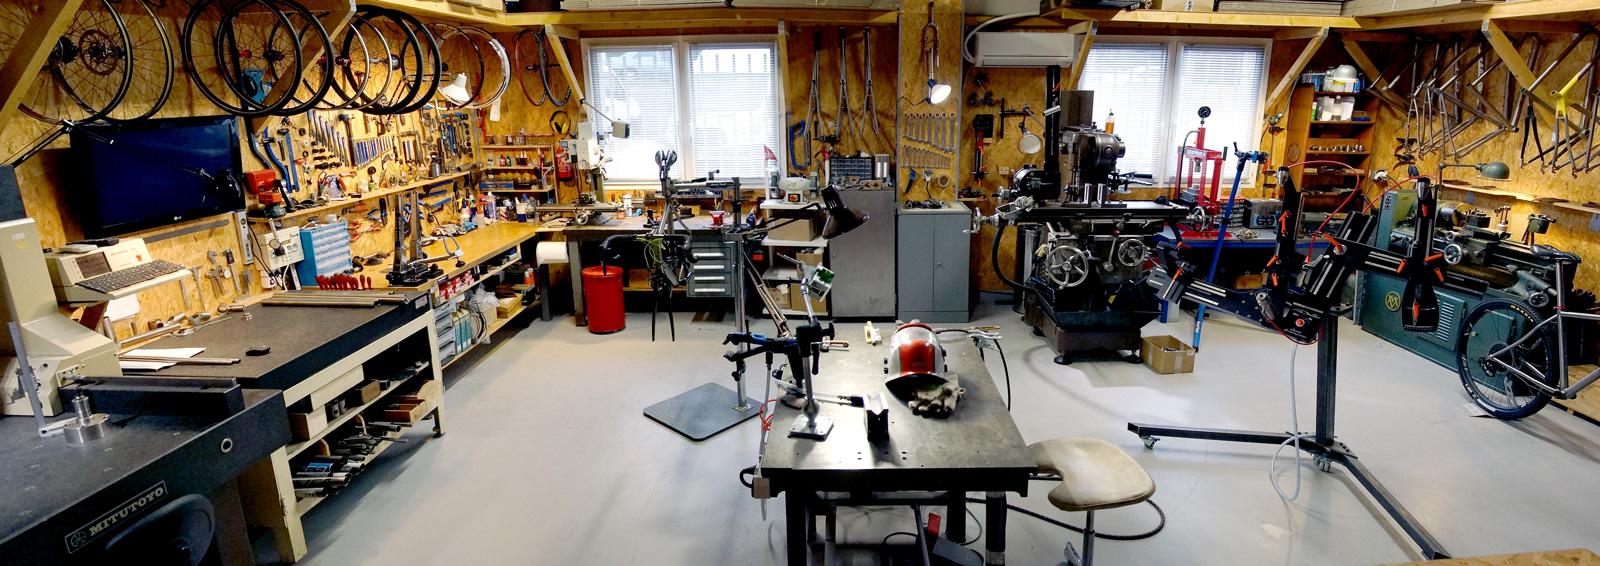 L'Atelier Titane, à la Motte-Servolex.